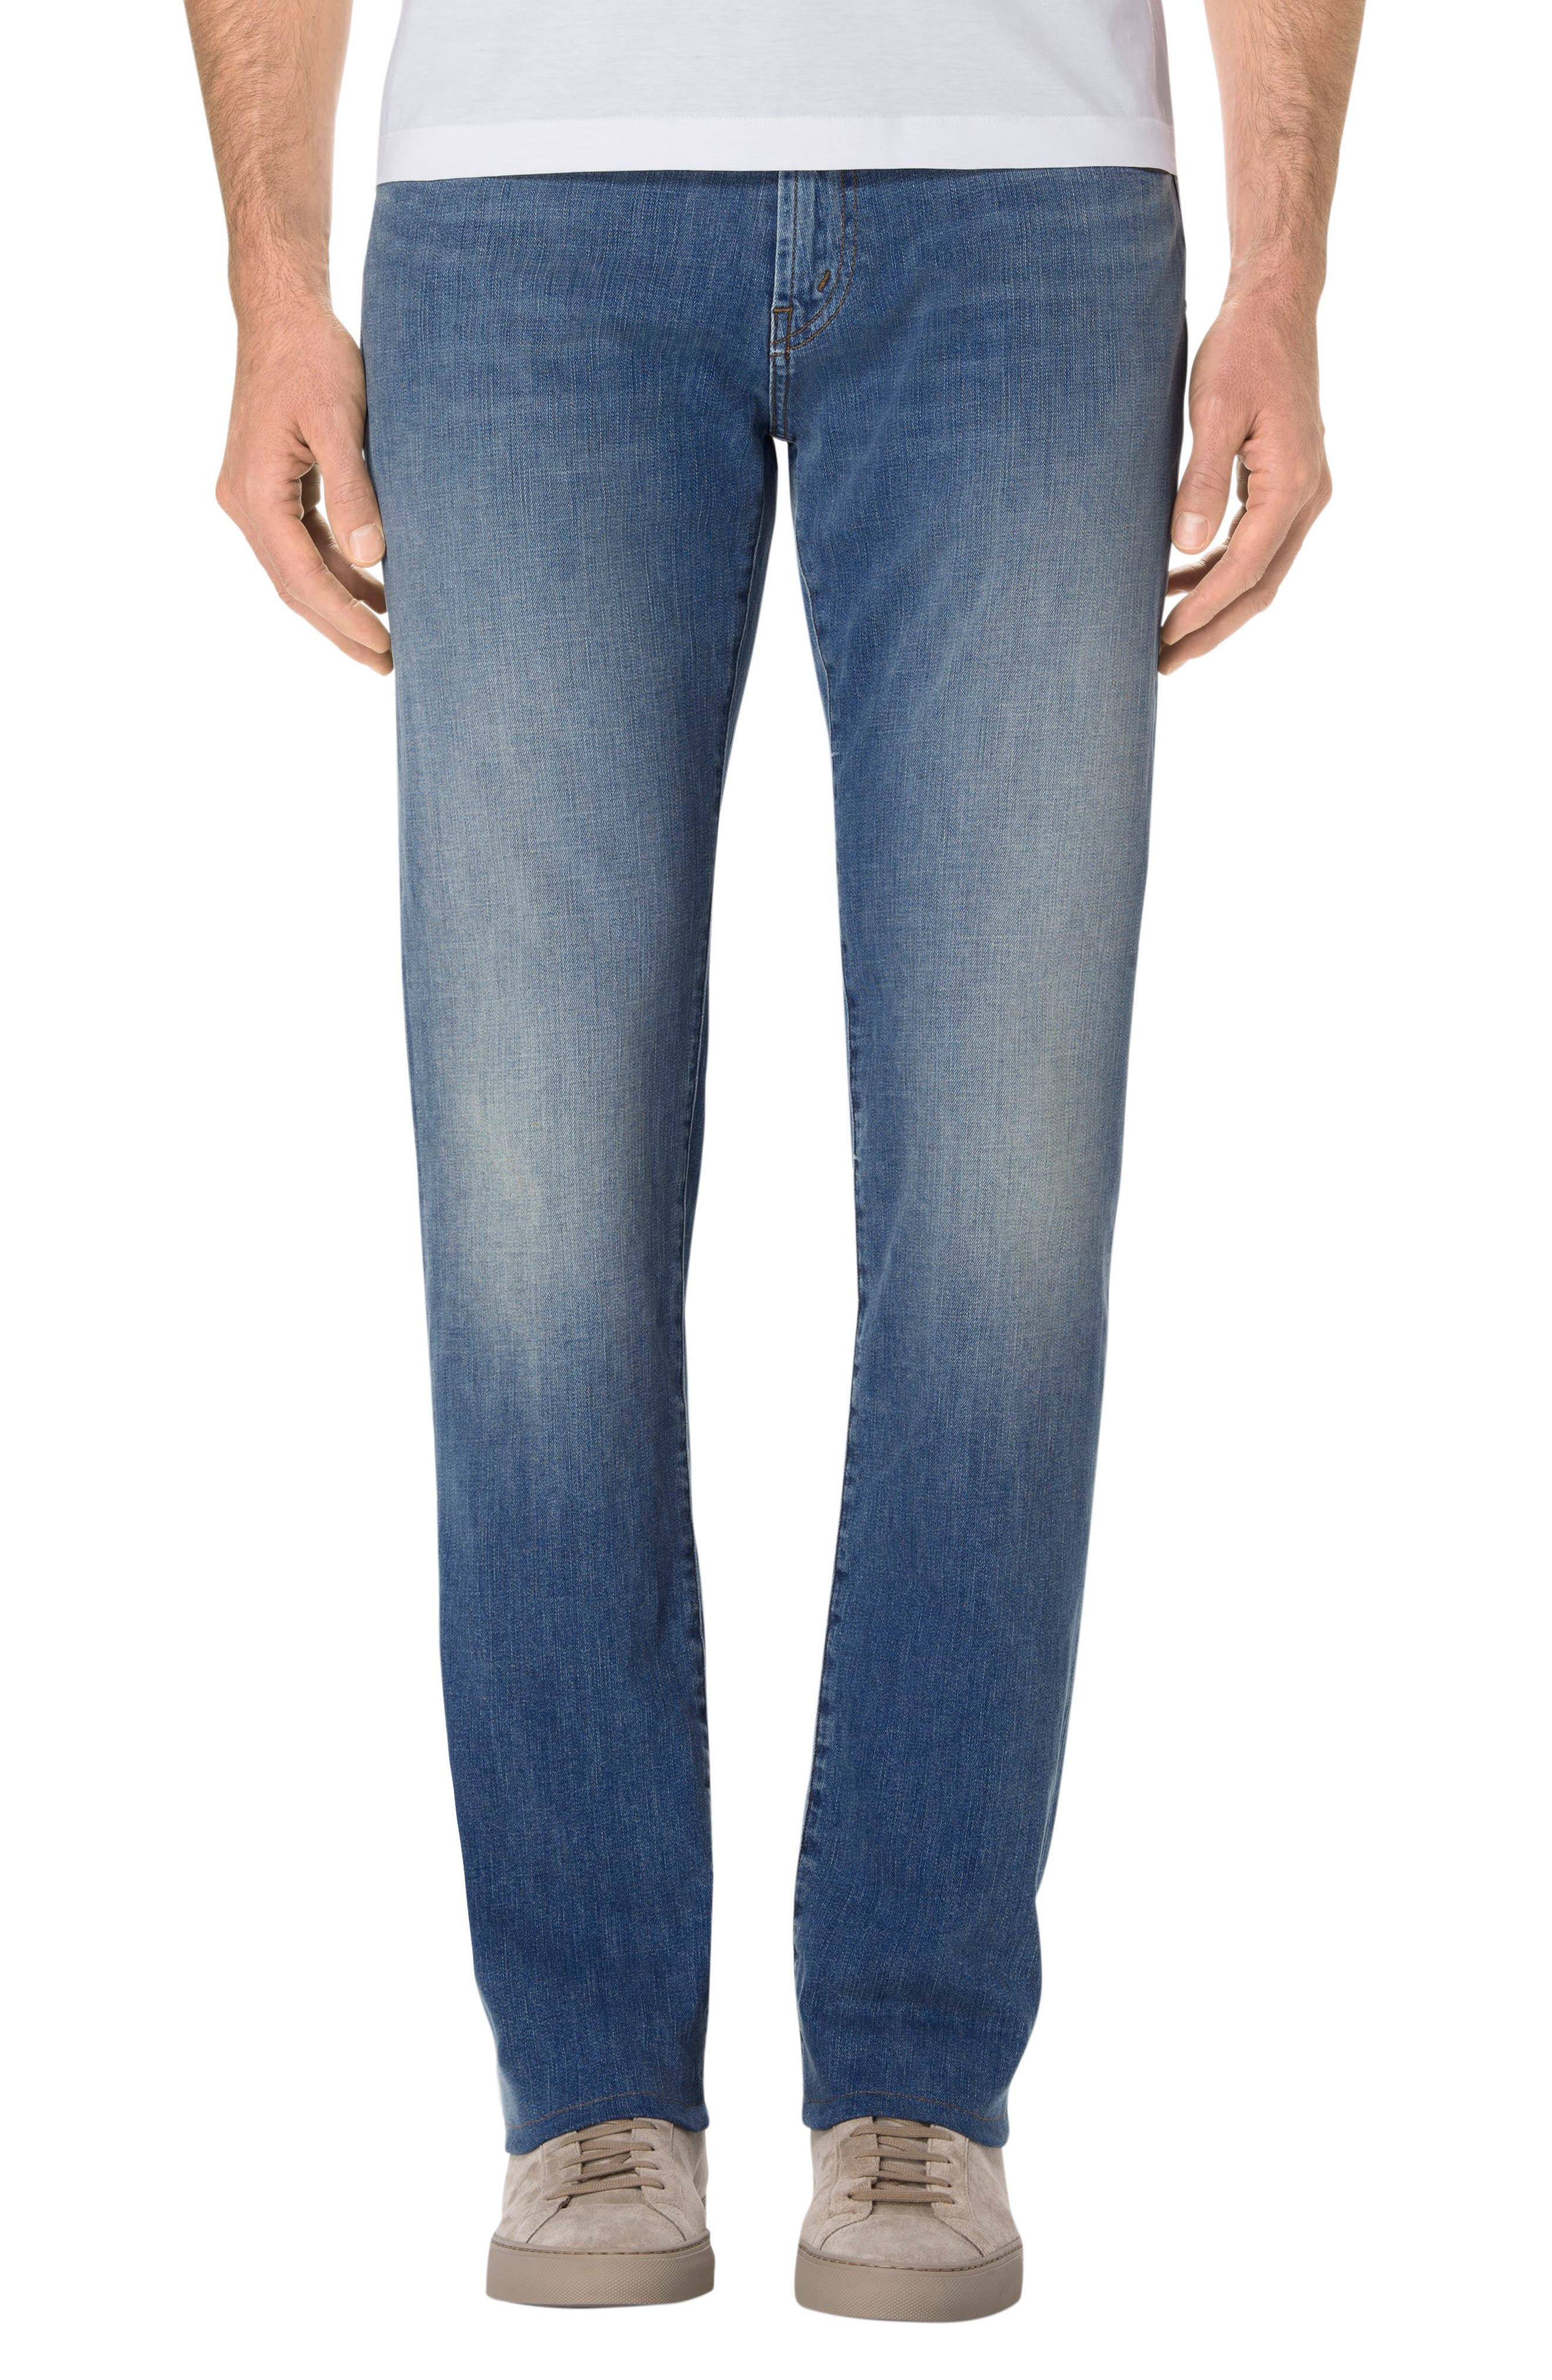 Alternate Image 1 Selected - J Brand Kane Slim Straight Fit Jeans (Hydrogen)